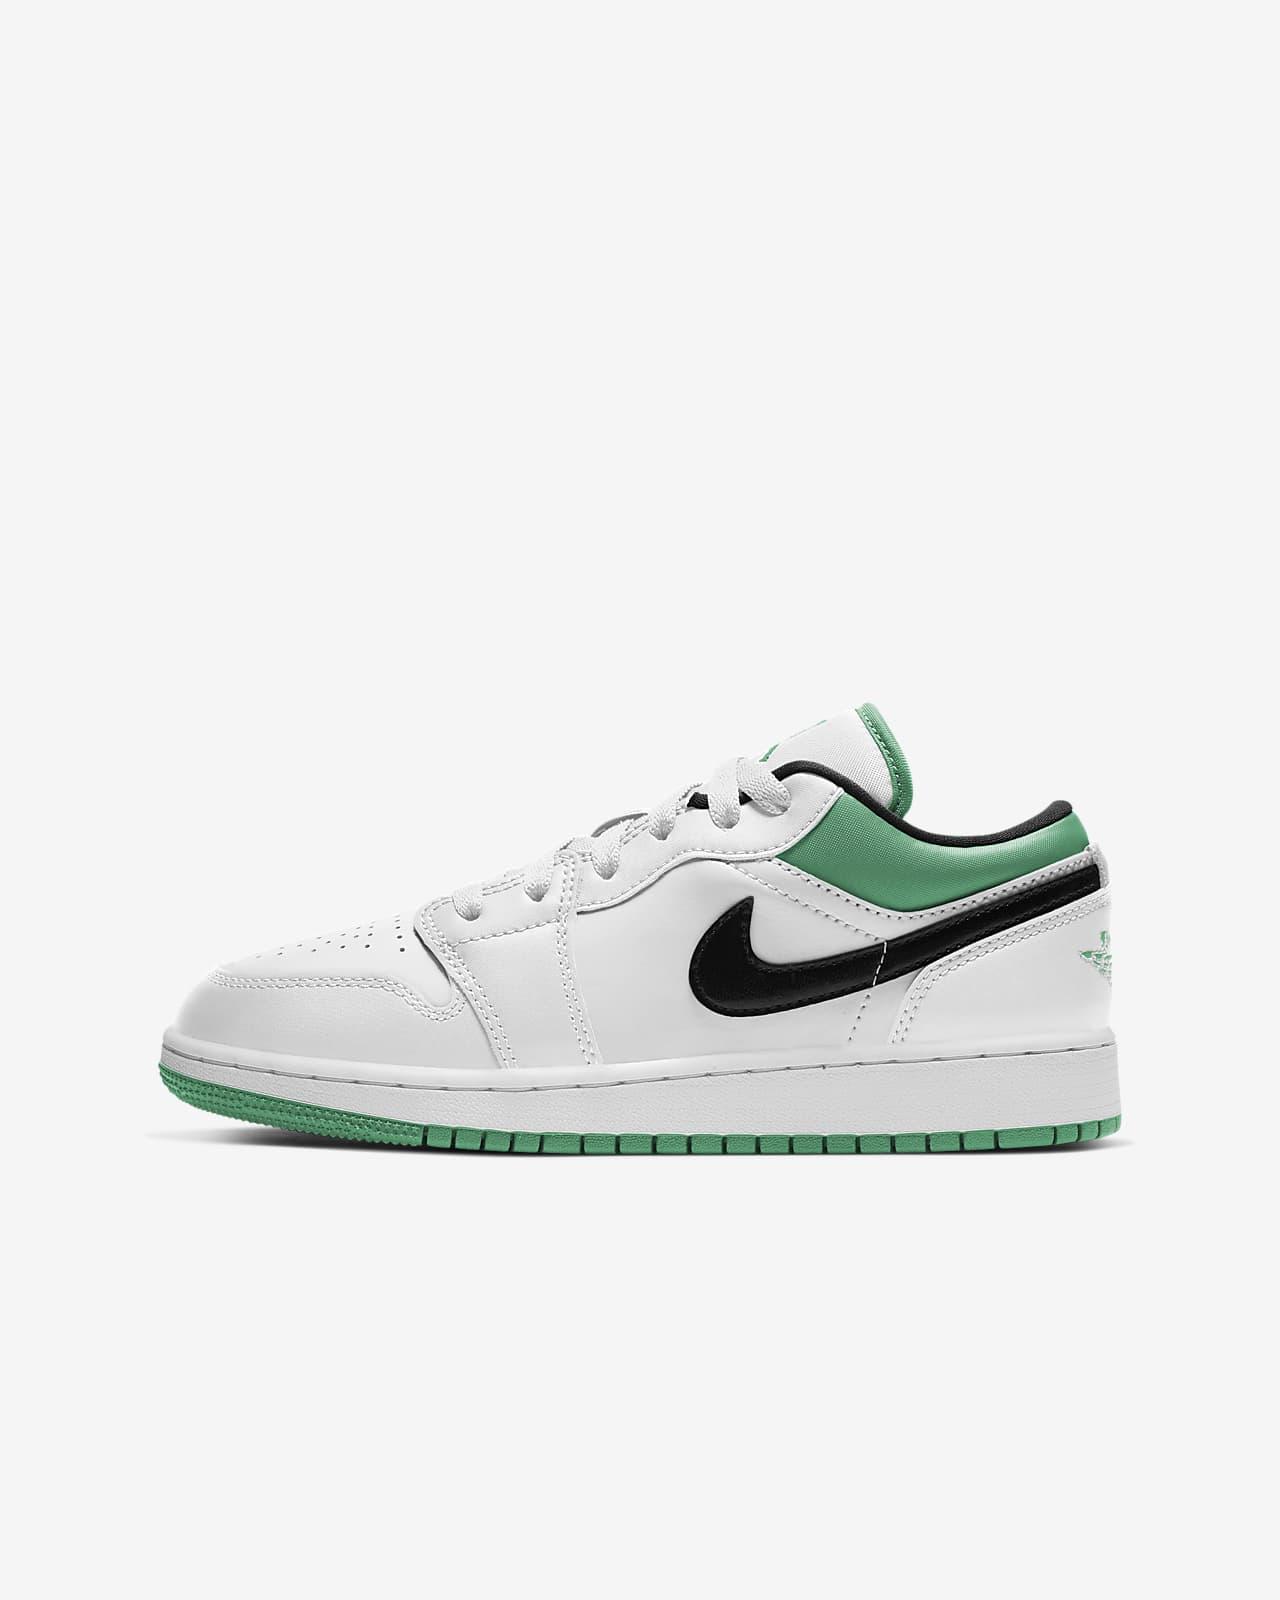 Calzado para niños talla grande Air Jordan 1 Low